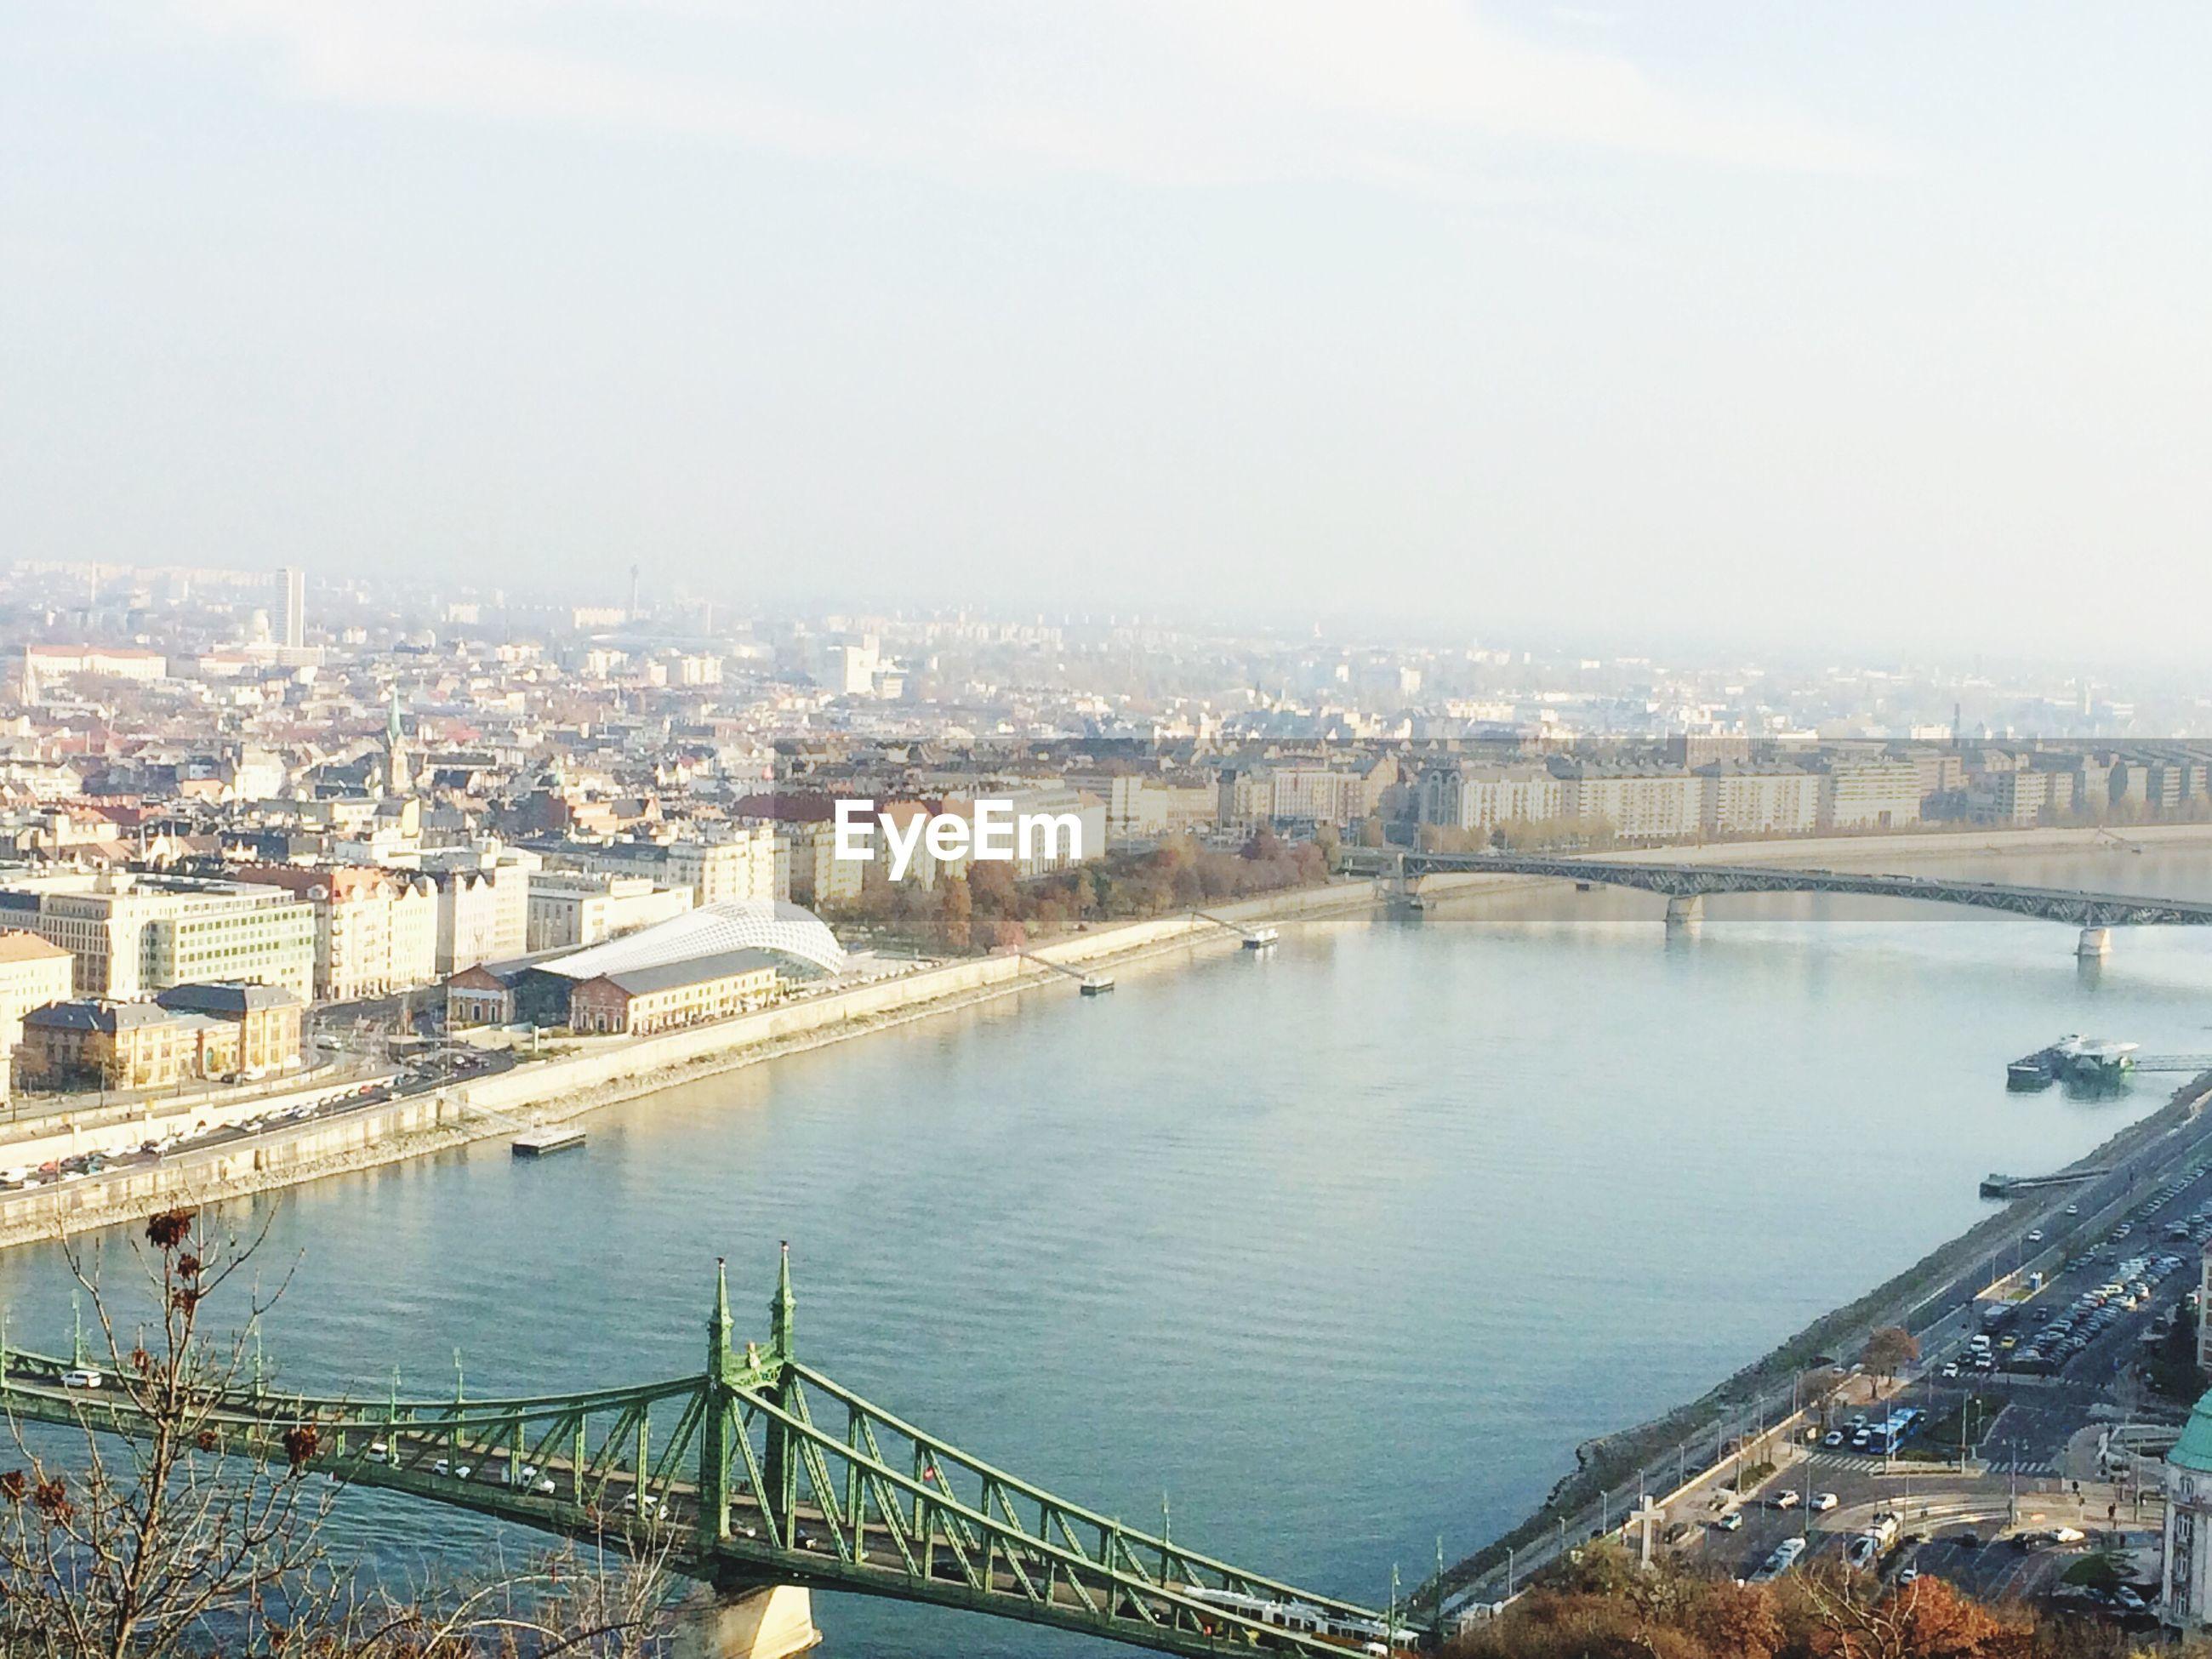 Bridges over river in city against sky